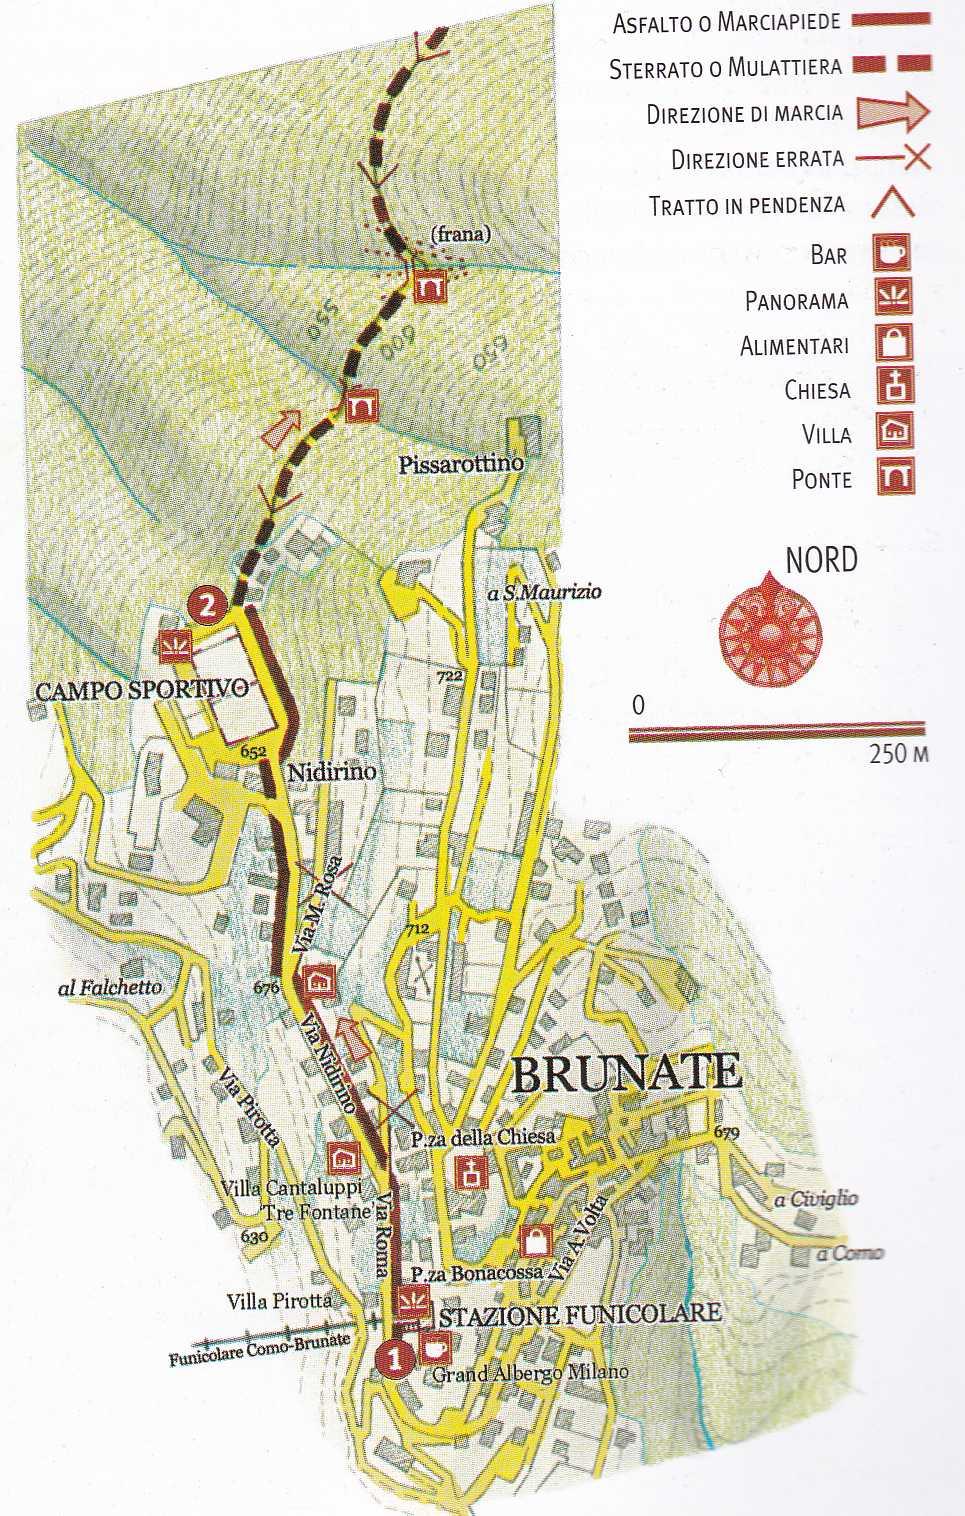 BRUNATE NESSO1877